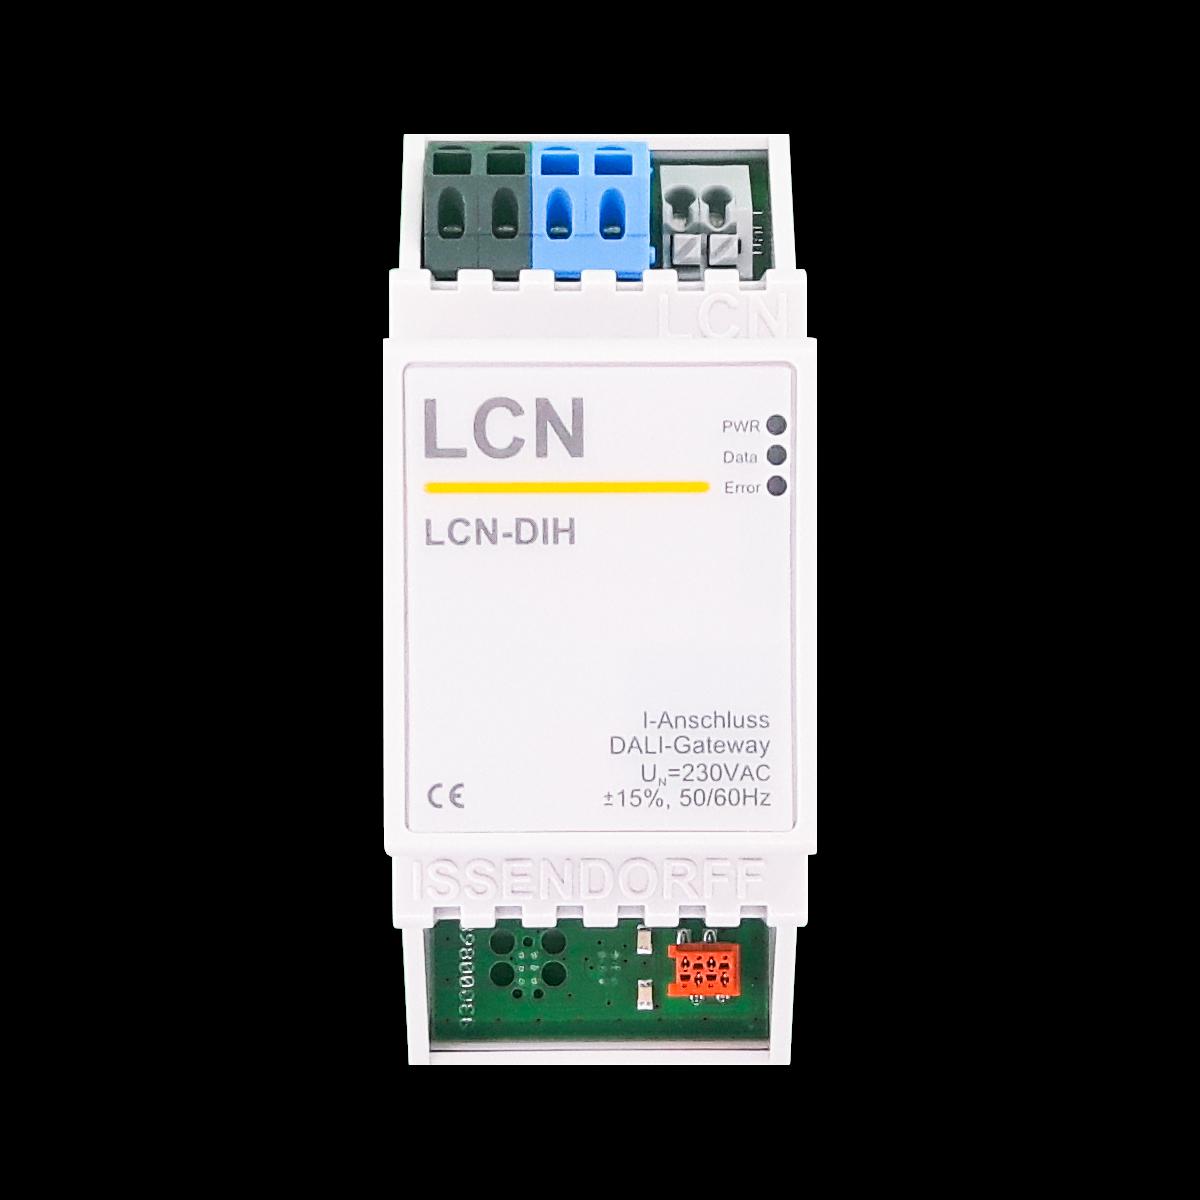 LCN-DIH